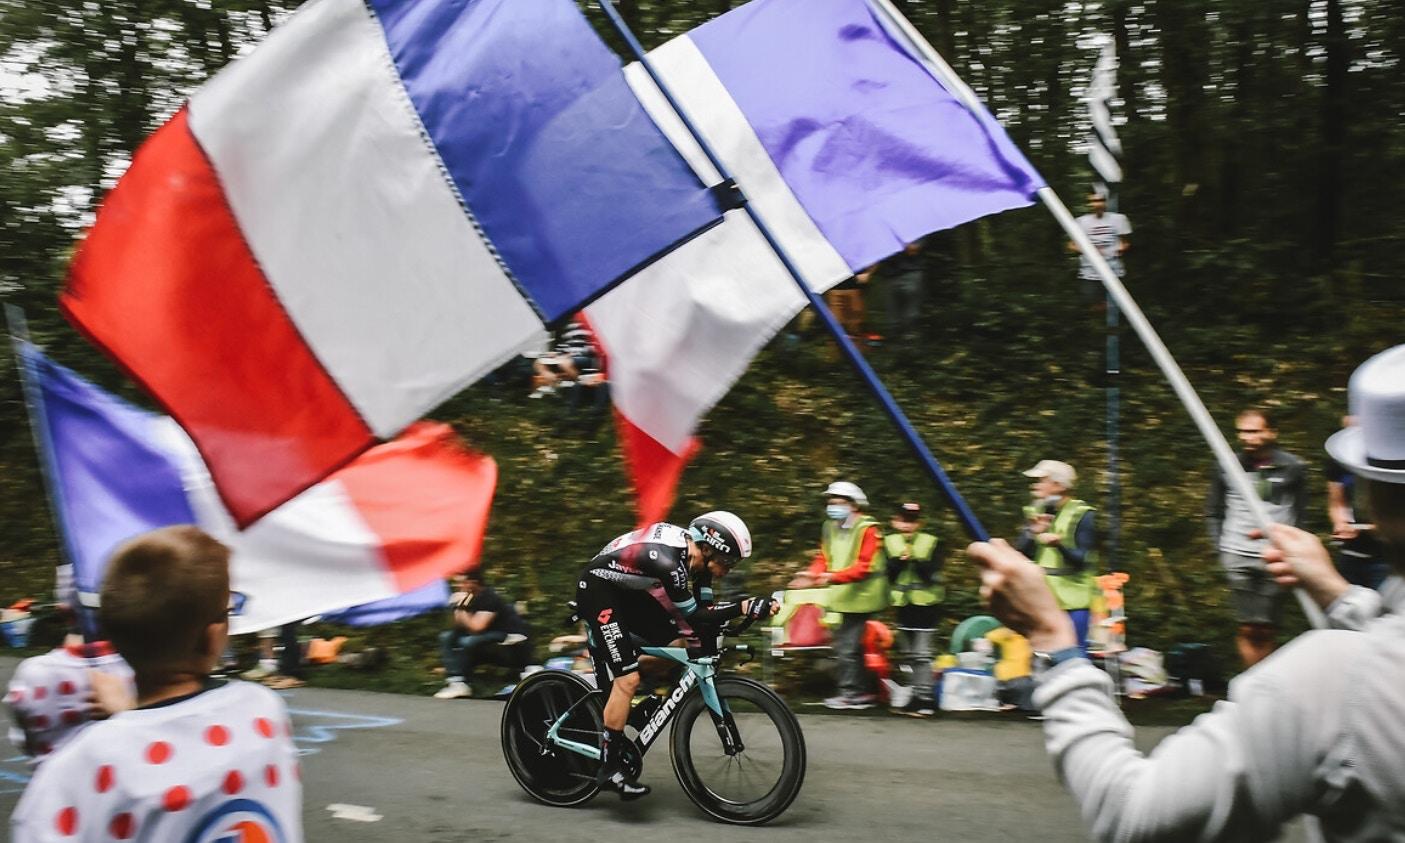 Tour de France 2021: samenvatting van de vijfde etappe